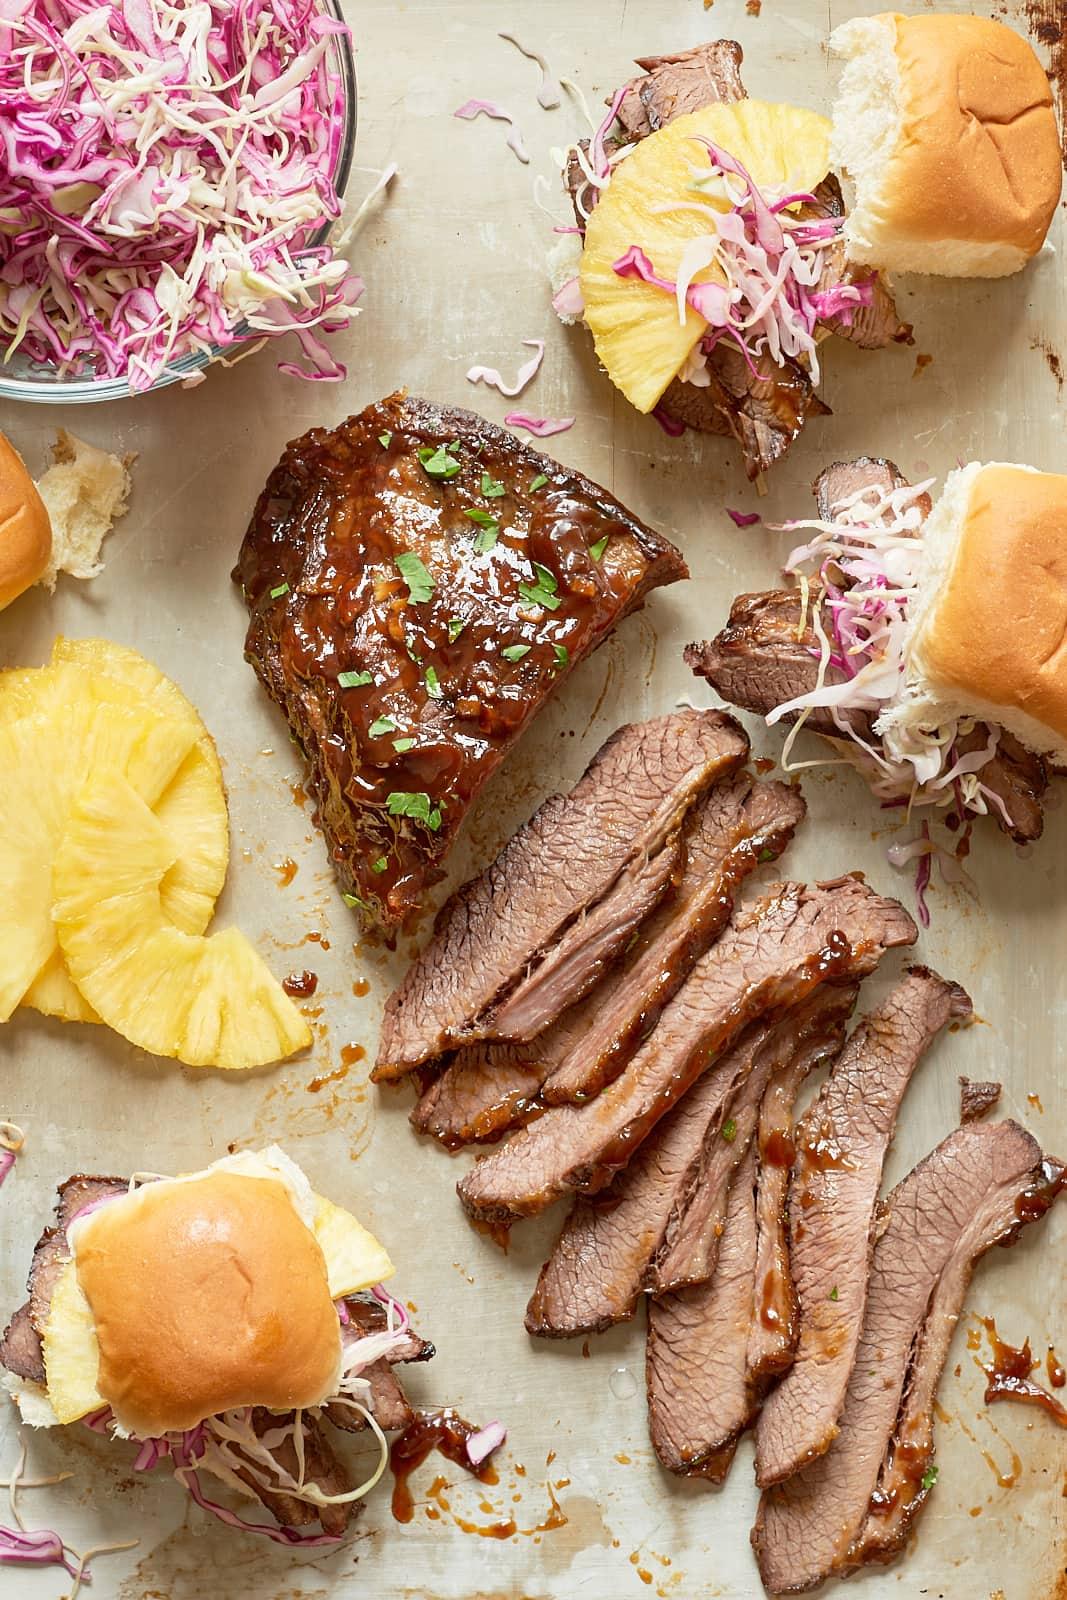 Recipe: Slow Cooker Hawaiian Brisket Sandwiches